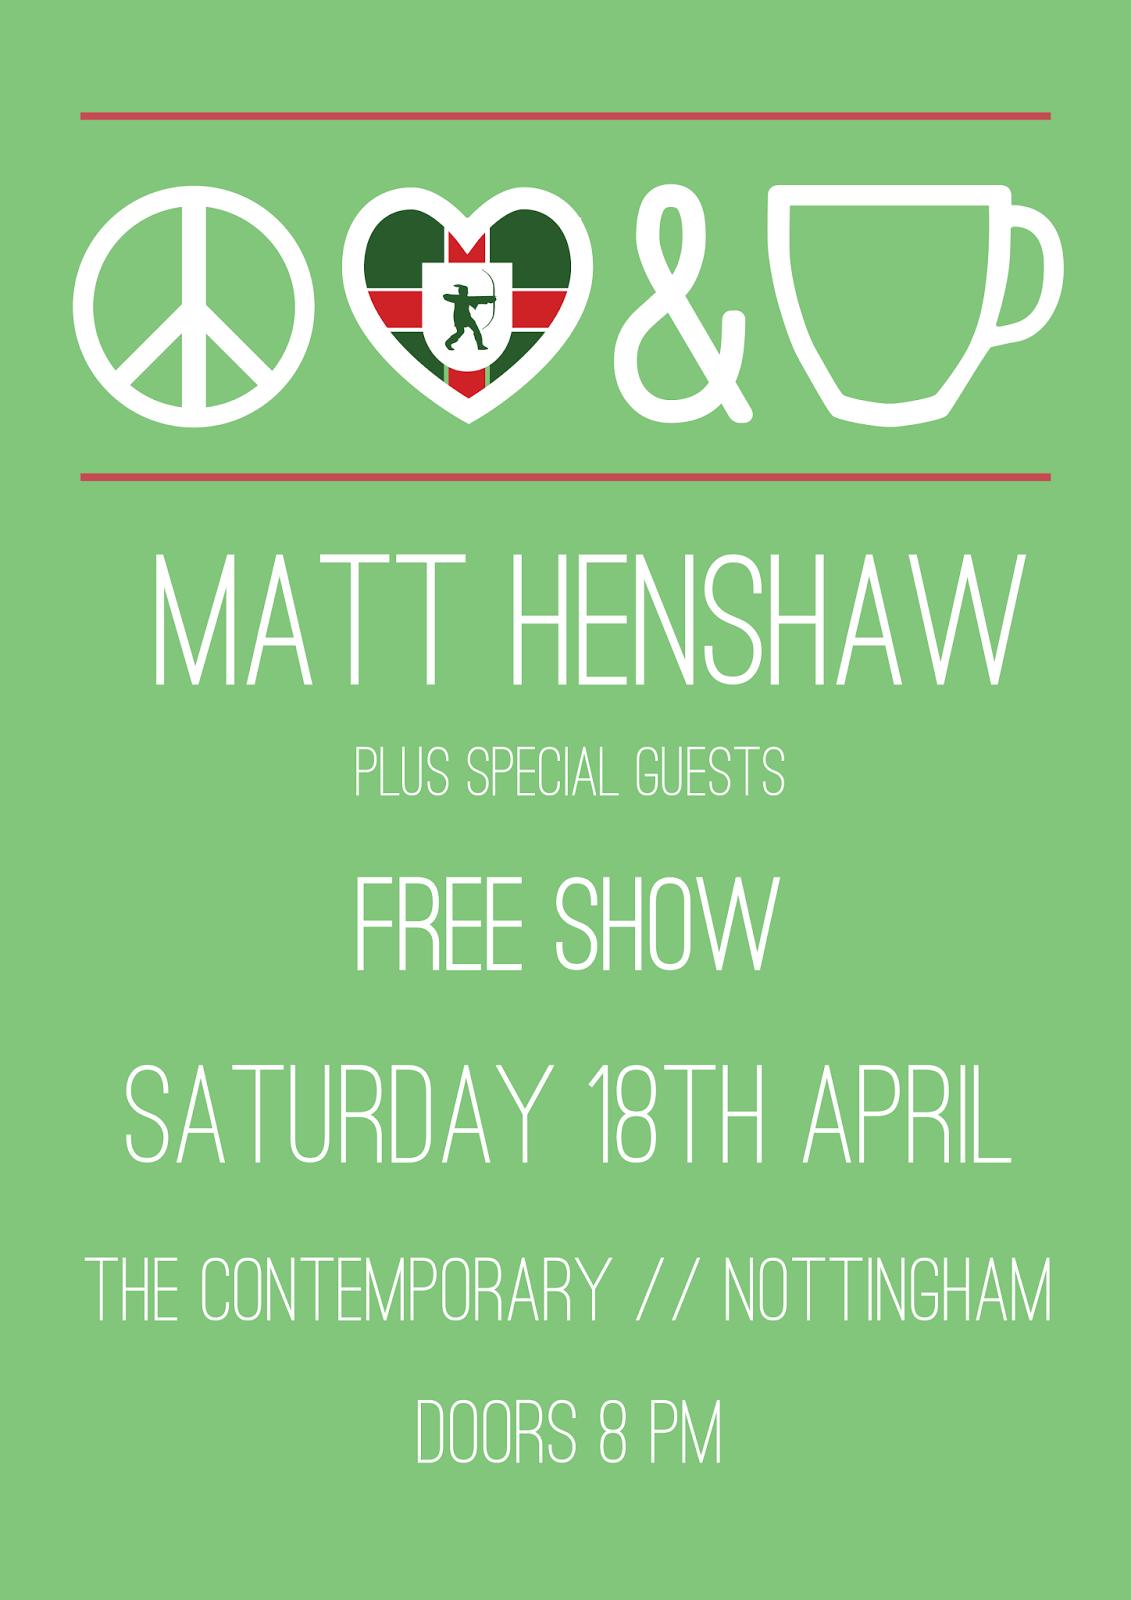 matt henshaw live in nottingham